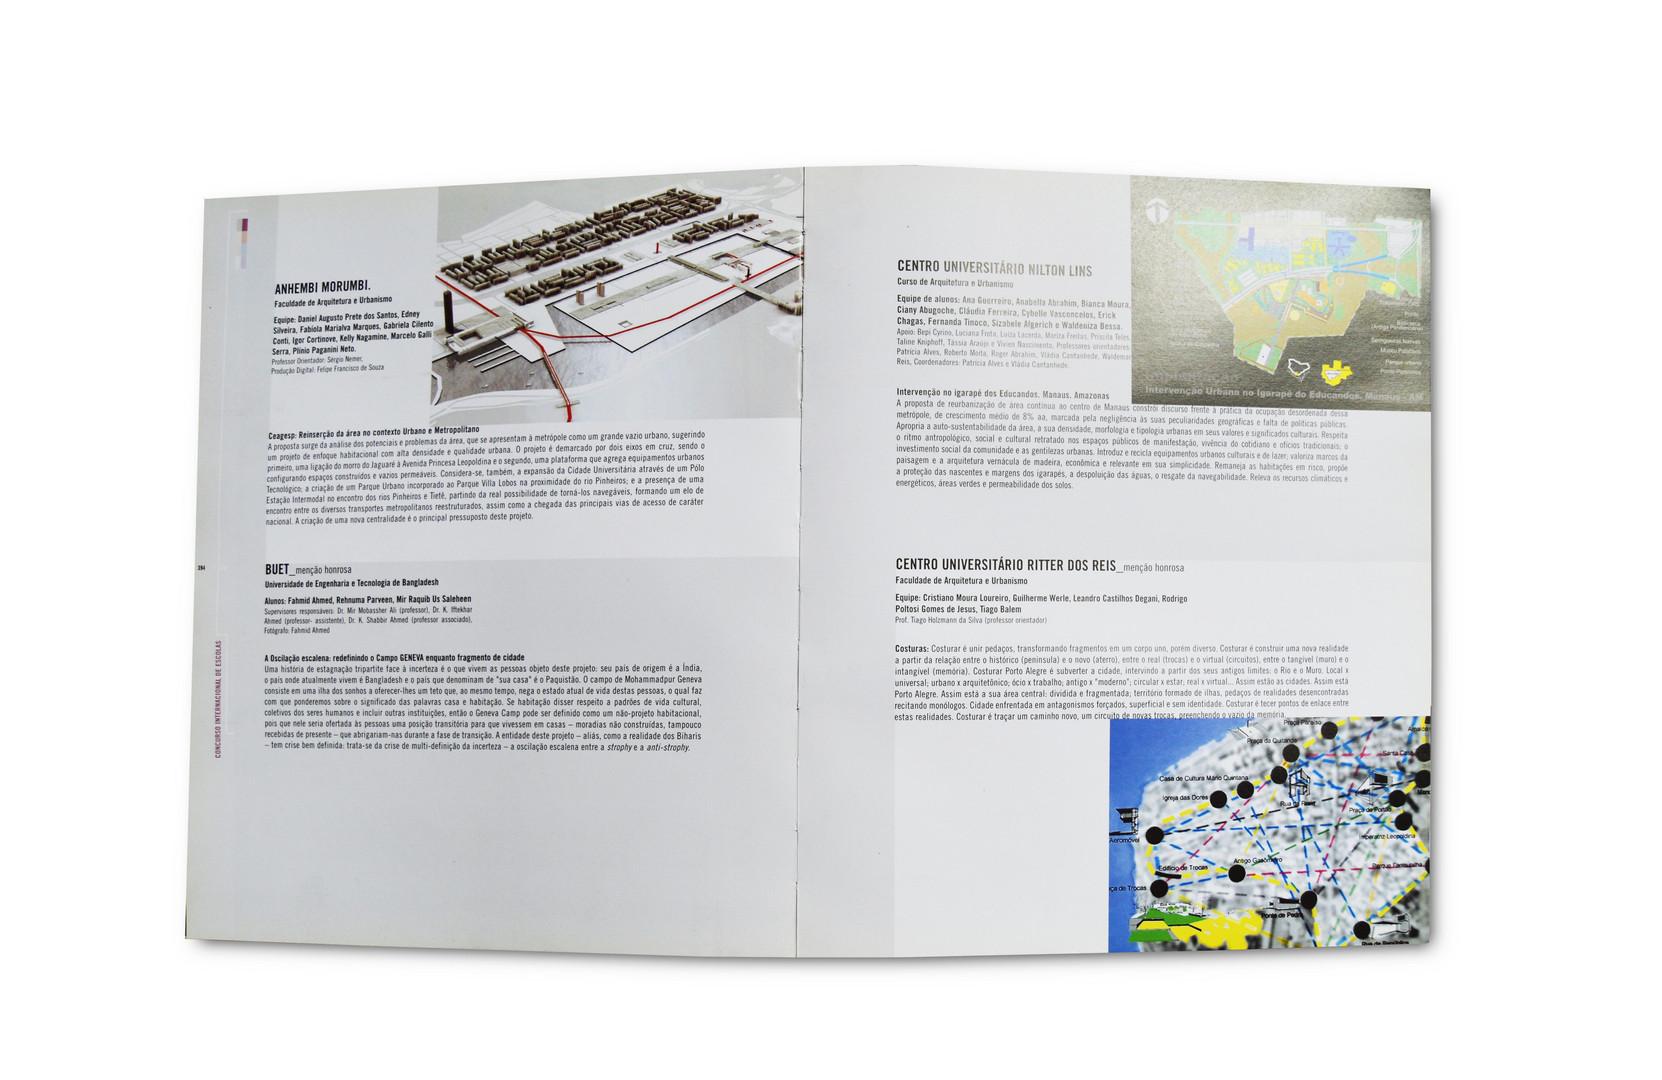 5 bienal de arq de sp metropoles.jpg